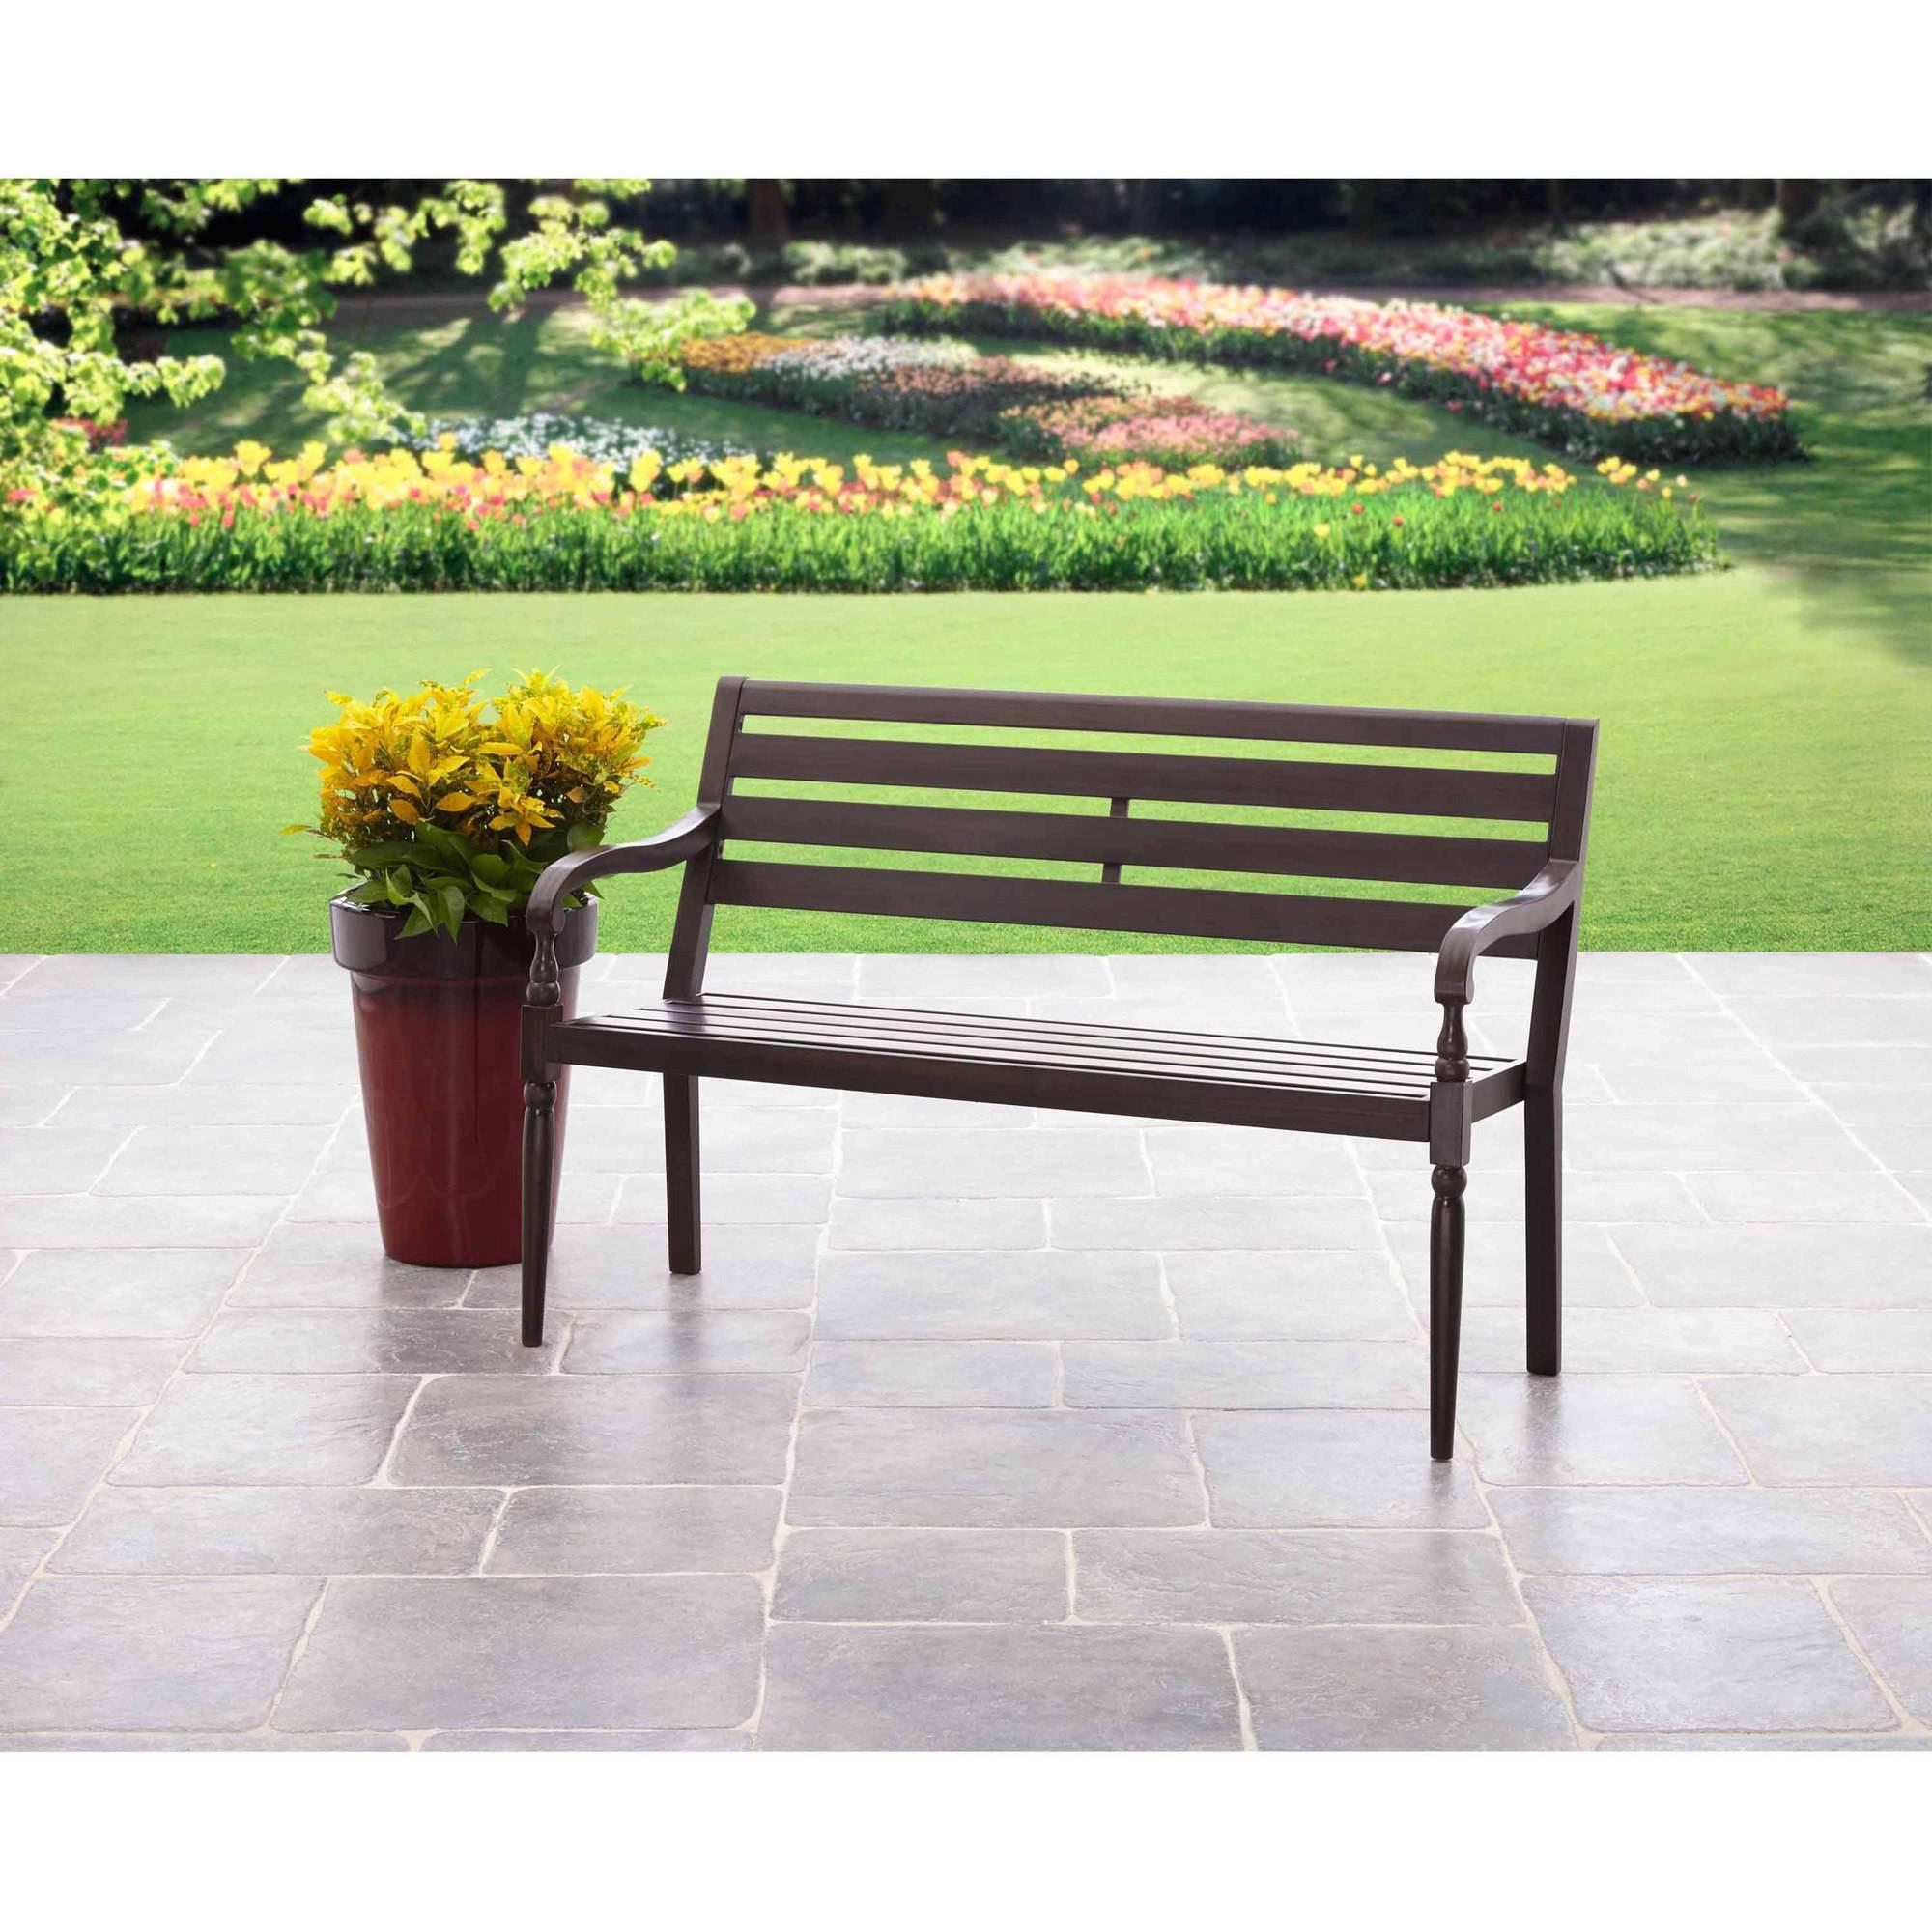 garden seat mainstays slat outdoor garden bench, black - walmart.com RLTZTFL